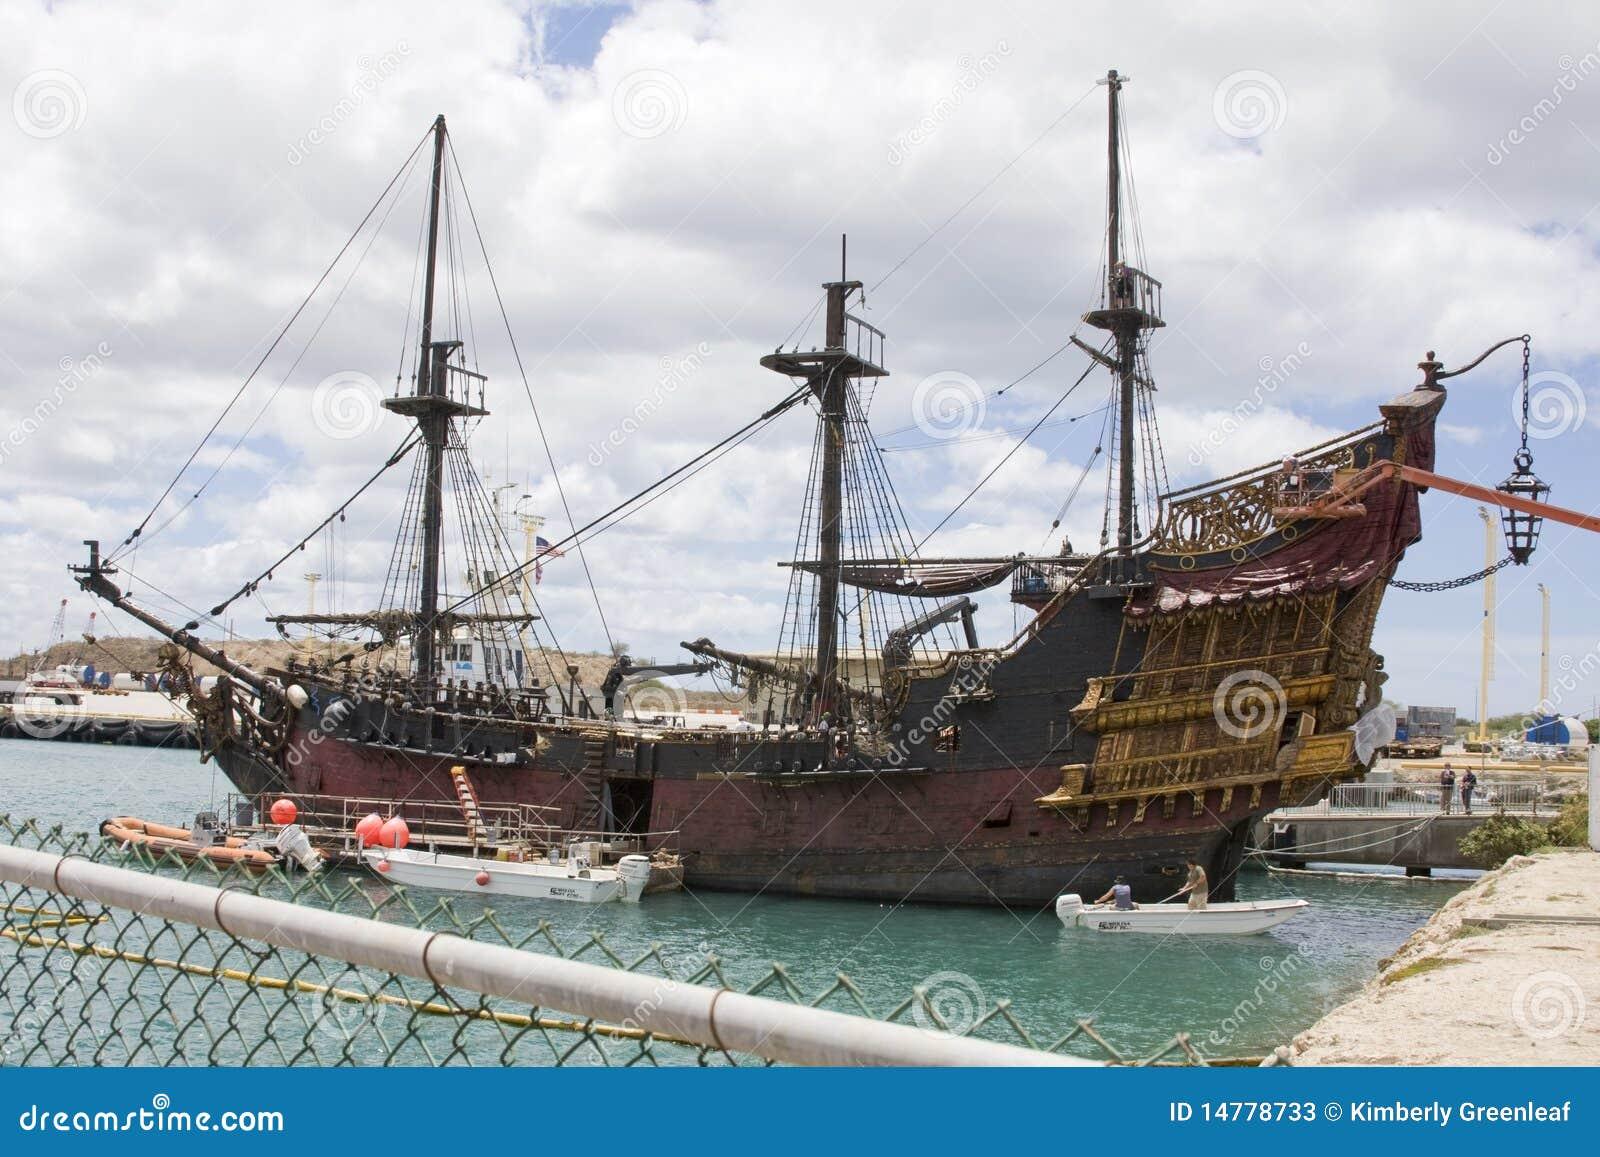 Pirates Of The Caribbean 4 Set Editorial Stock Photo